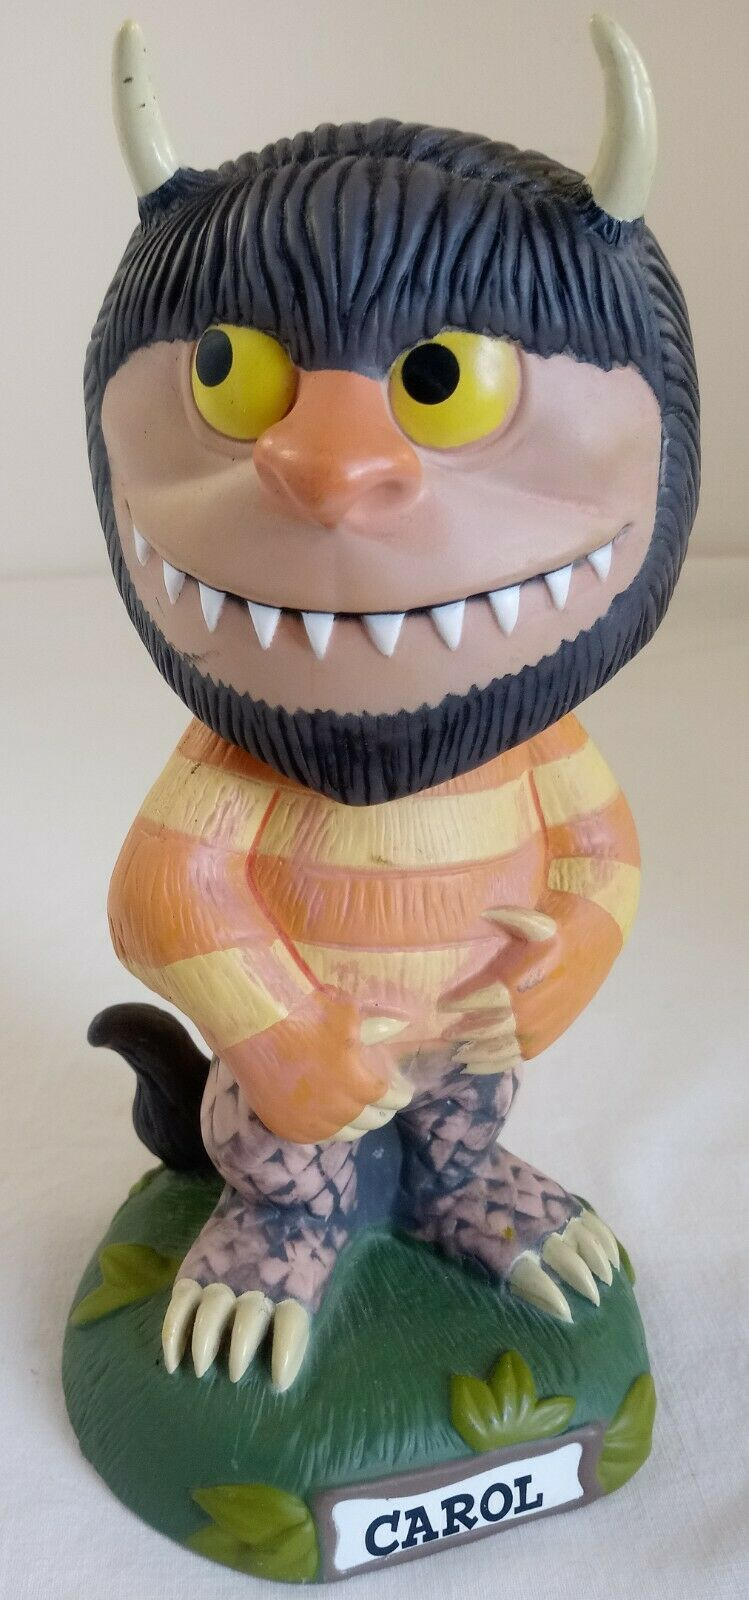 Funko Where The Wild Things Are Carol Wacky Wobbler Bobble Head 2008 - $34.64